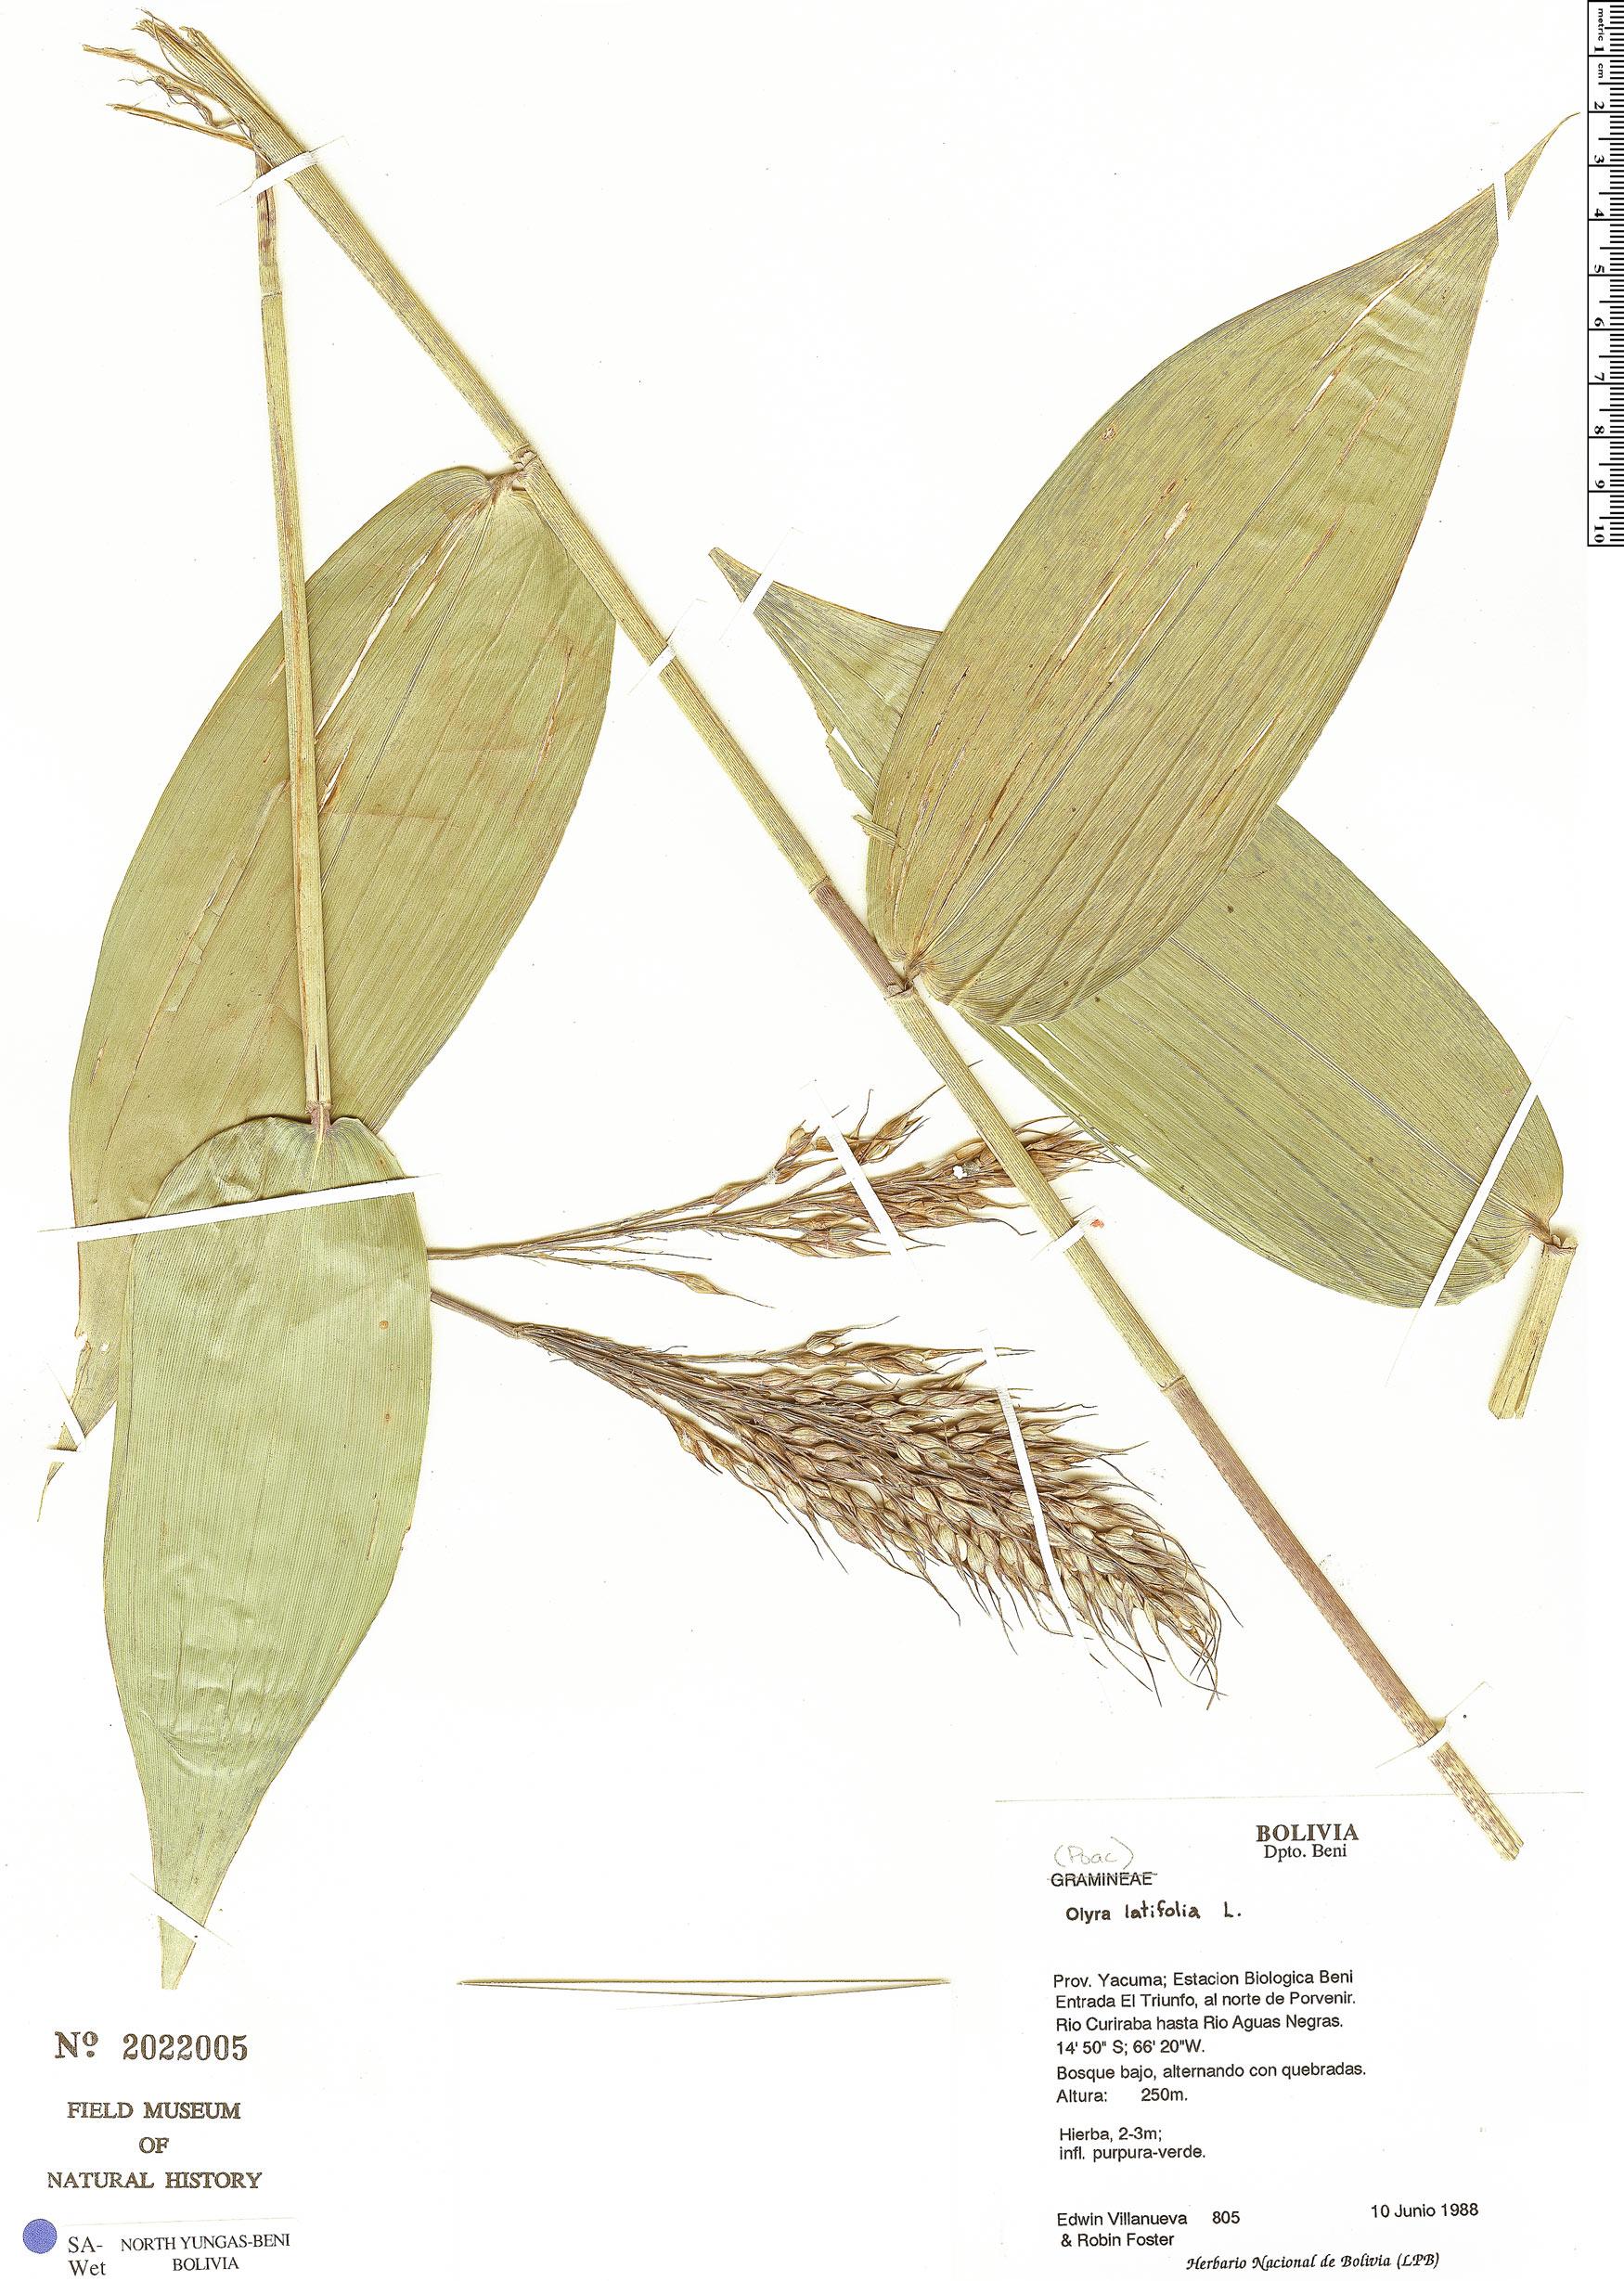 Specimen: Olyra latifolia